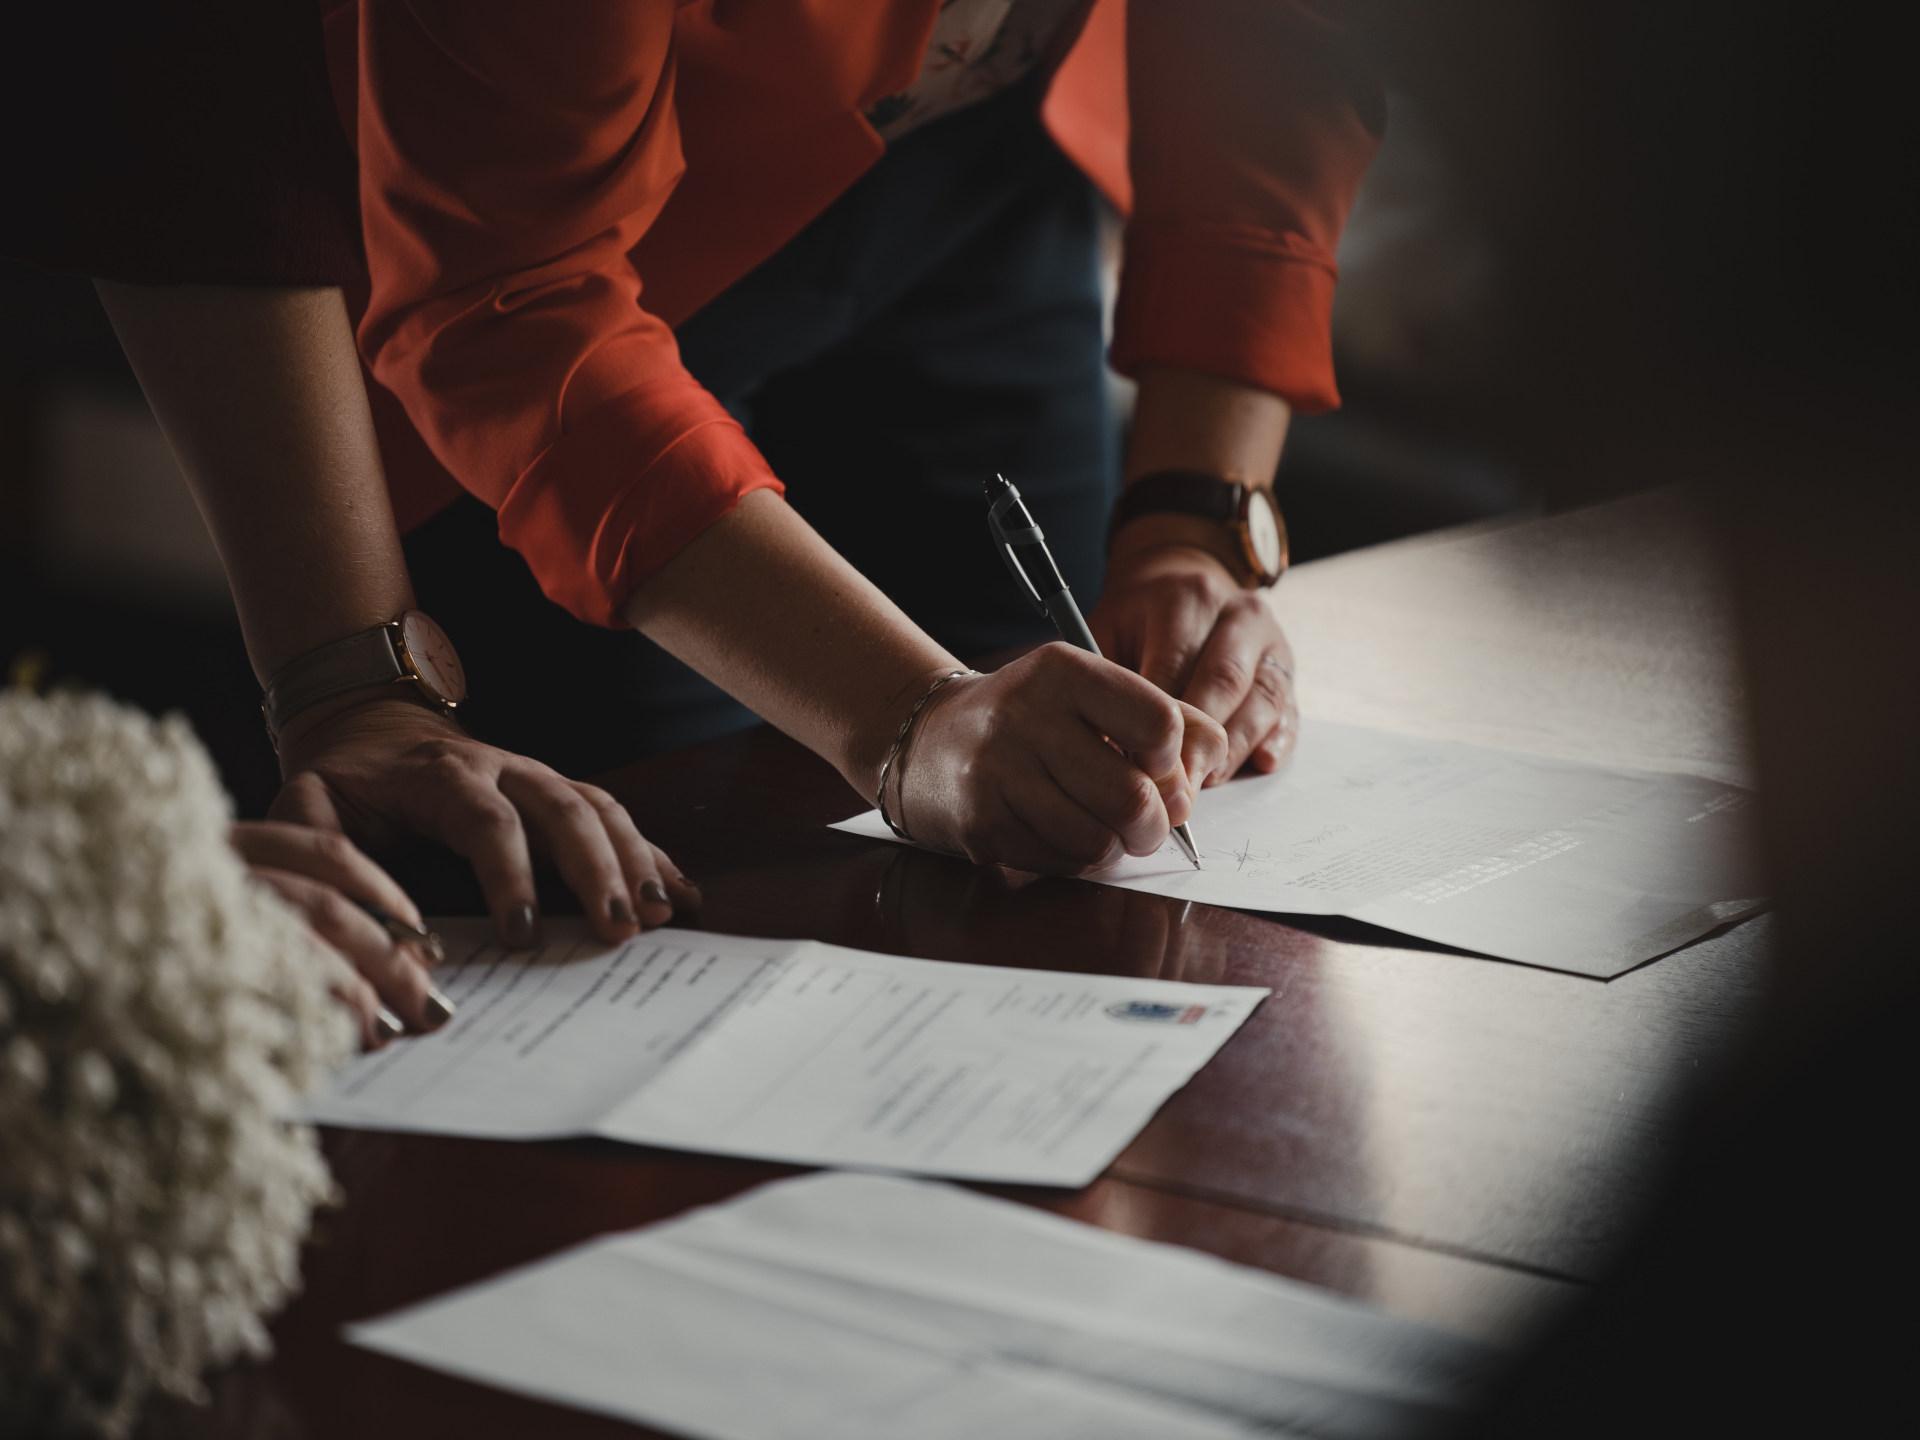 liiketoiminta kauppa sopimus